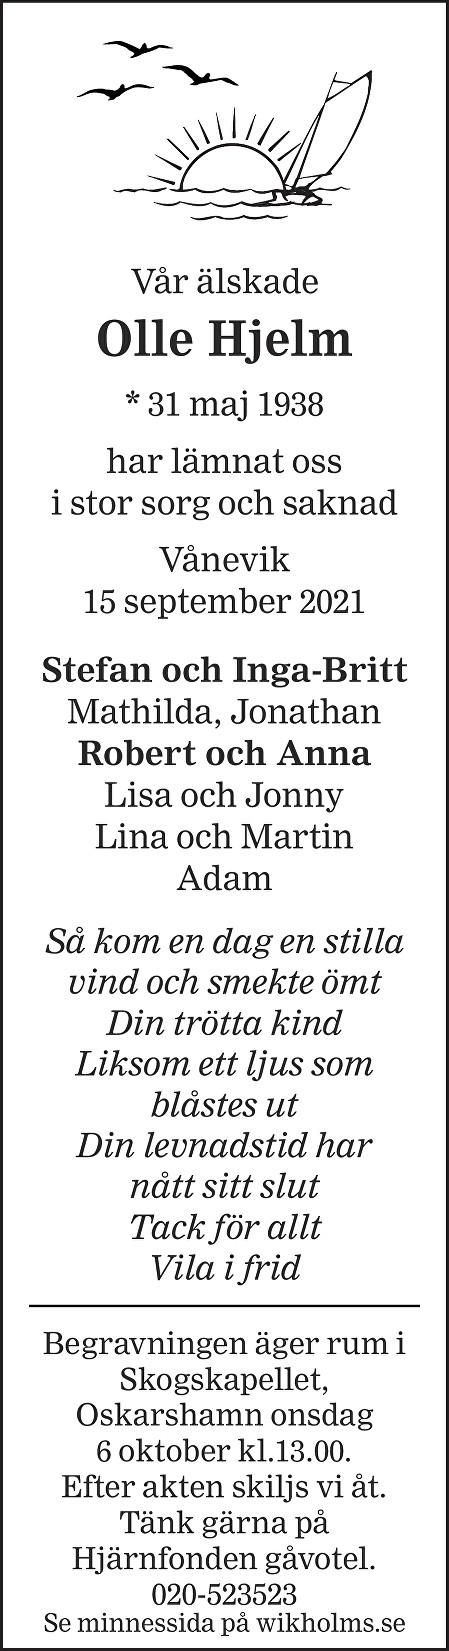 Olle Hjelm Death notice